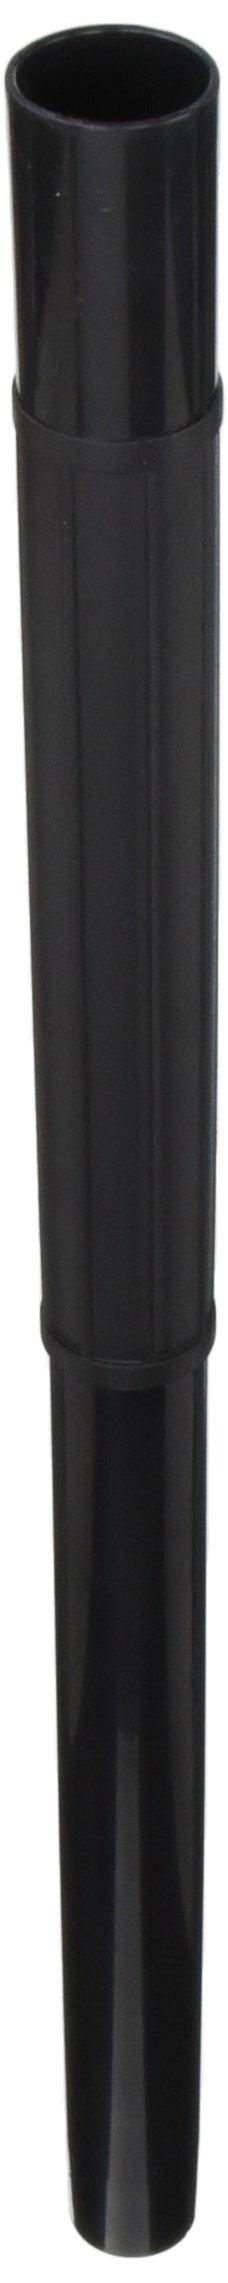 Wand, 22'' X 1-1/4'' Black Plastic ProForce 1500XP